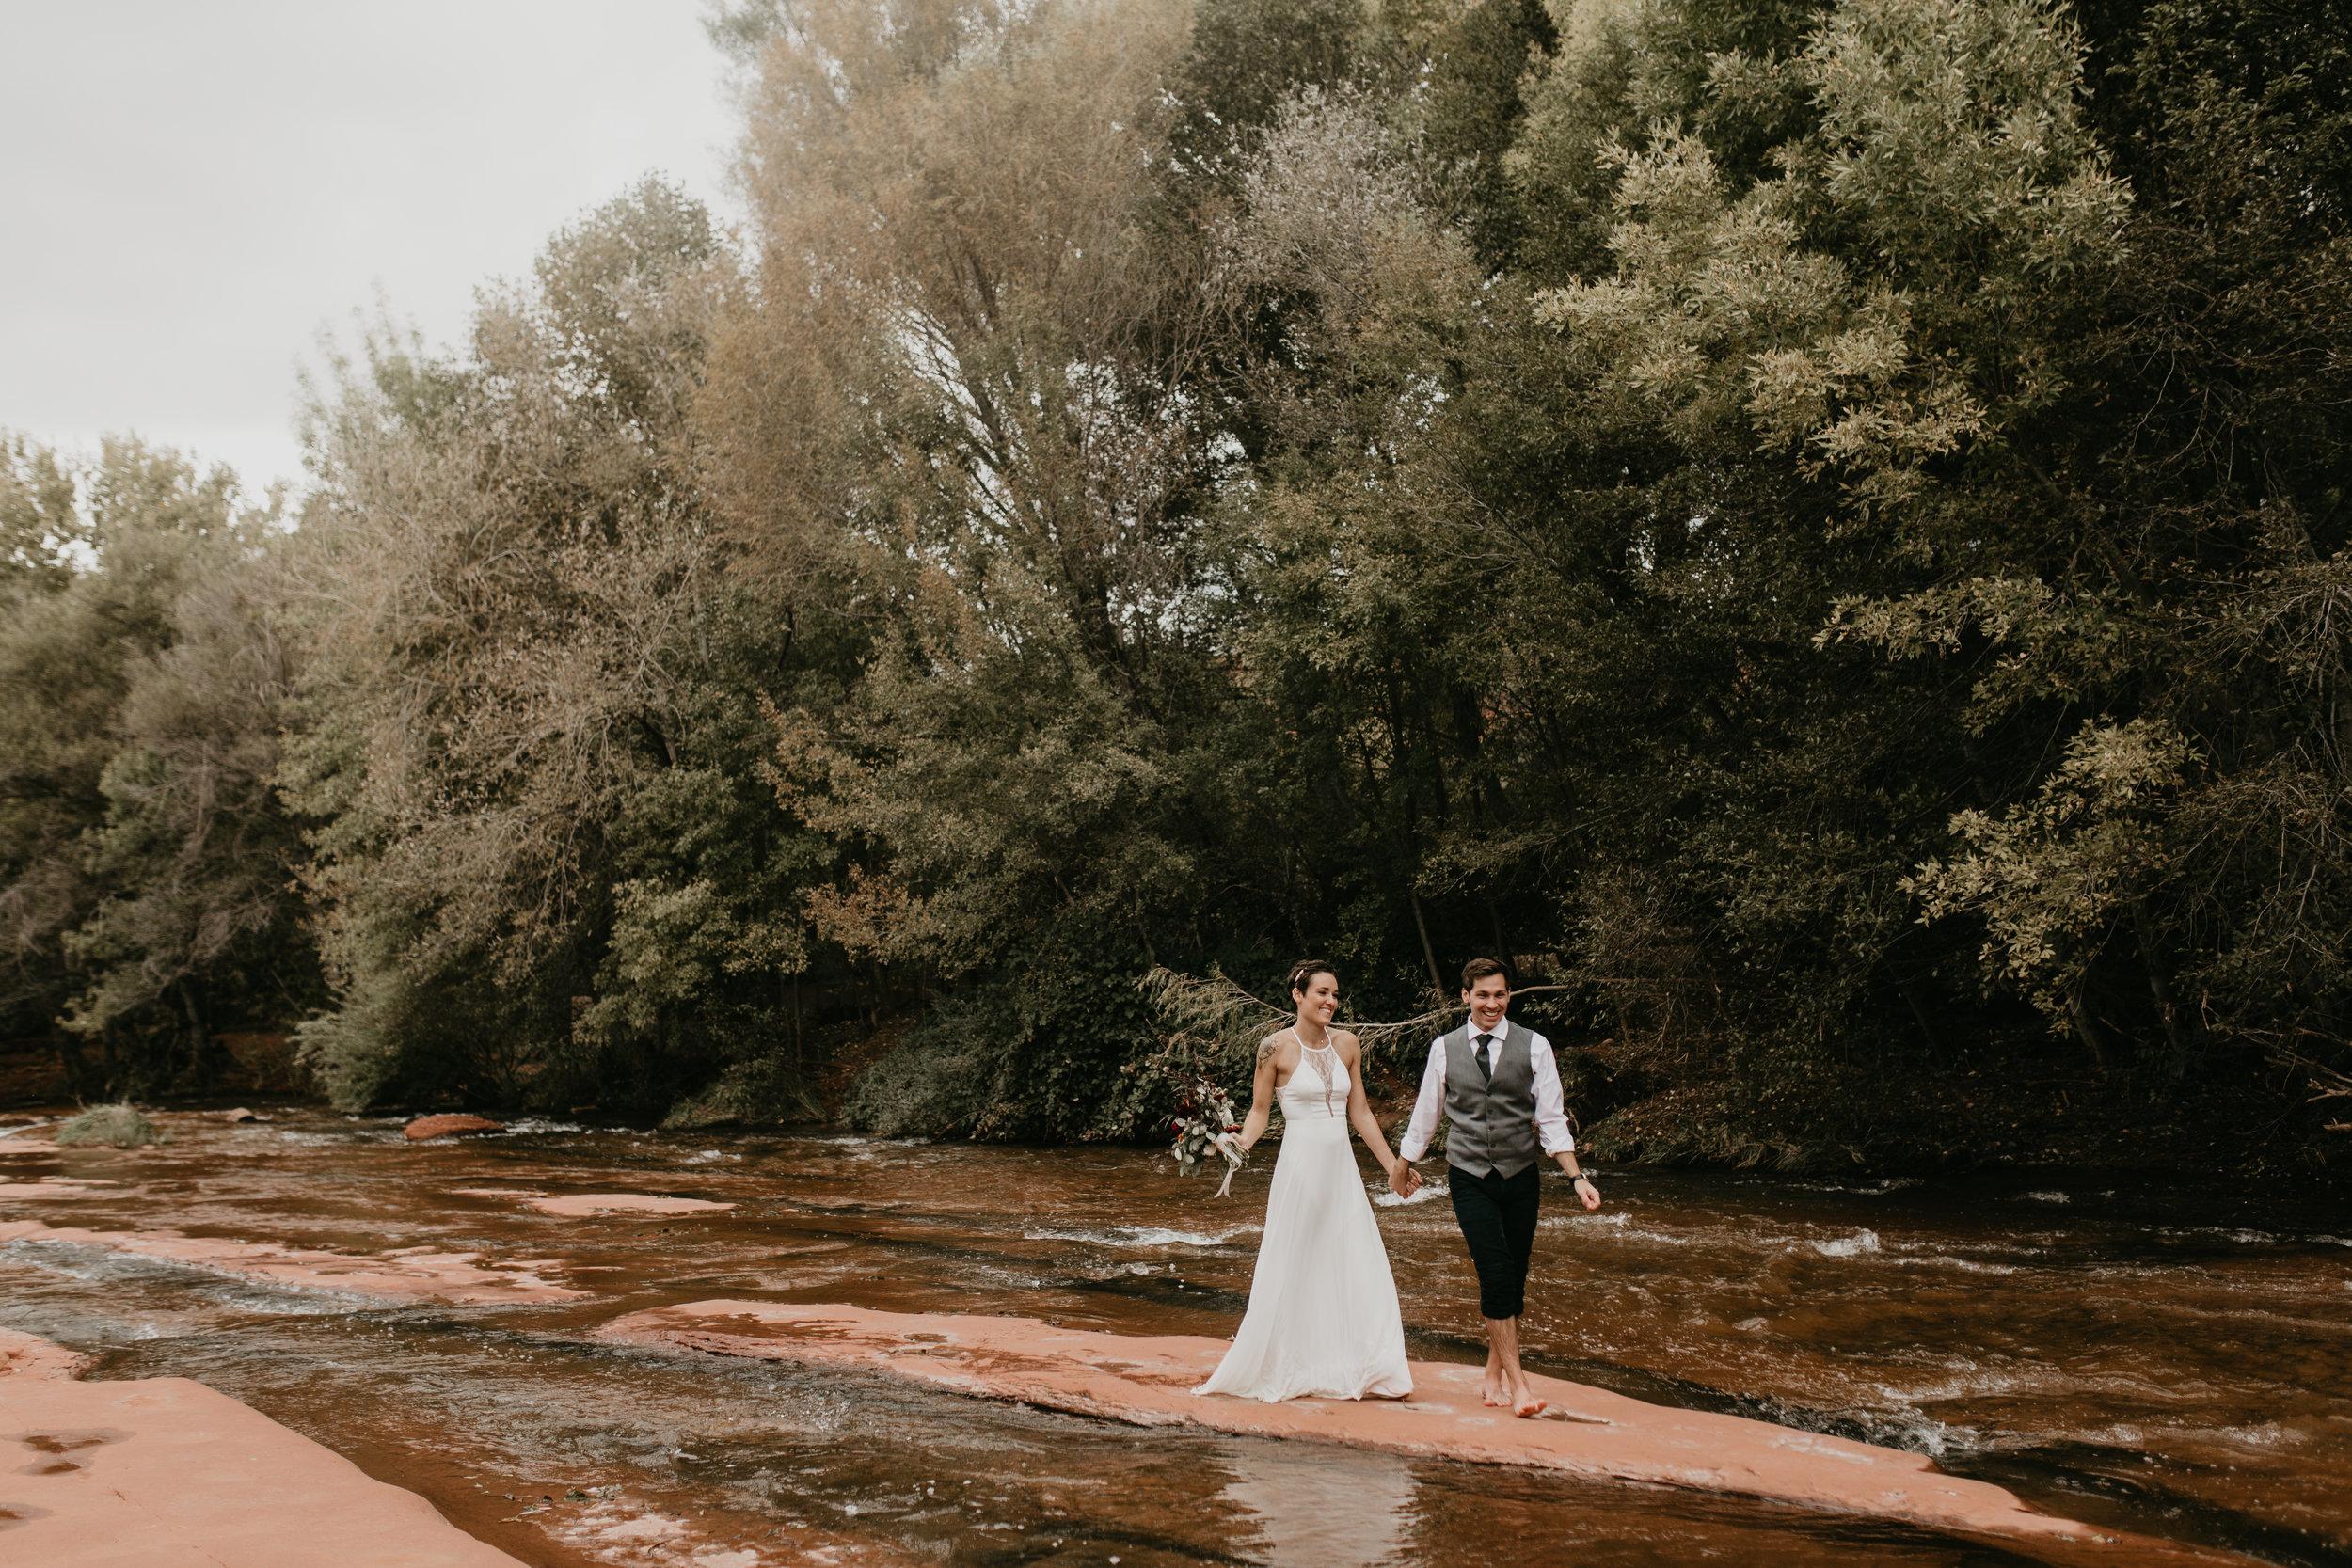 nicole-daacke-photography-sedona-arizona-destination-elopement-wedding-photographer-catherdral-rock-hiking-elopement-sedona-river-elopement-photos-desert-rock-wedding-photographer-laid-back-spontaneous-elopement-113.jpg